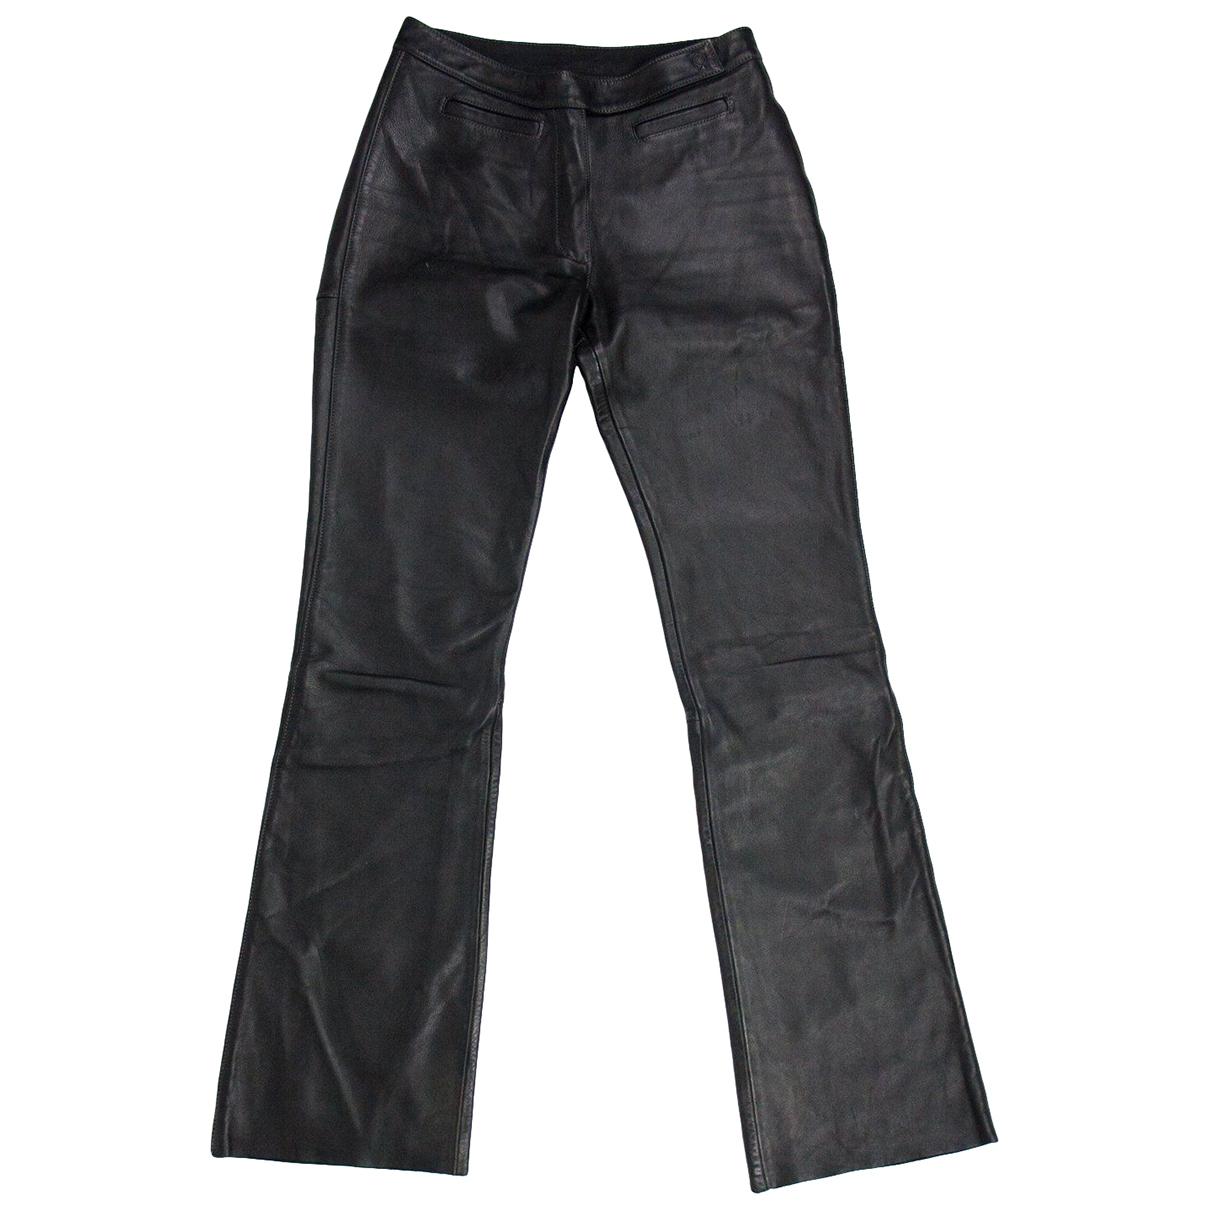 Hein Gericke - Pantalon   pour femme en cuir - noir